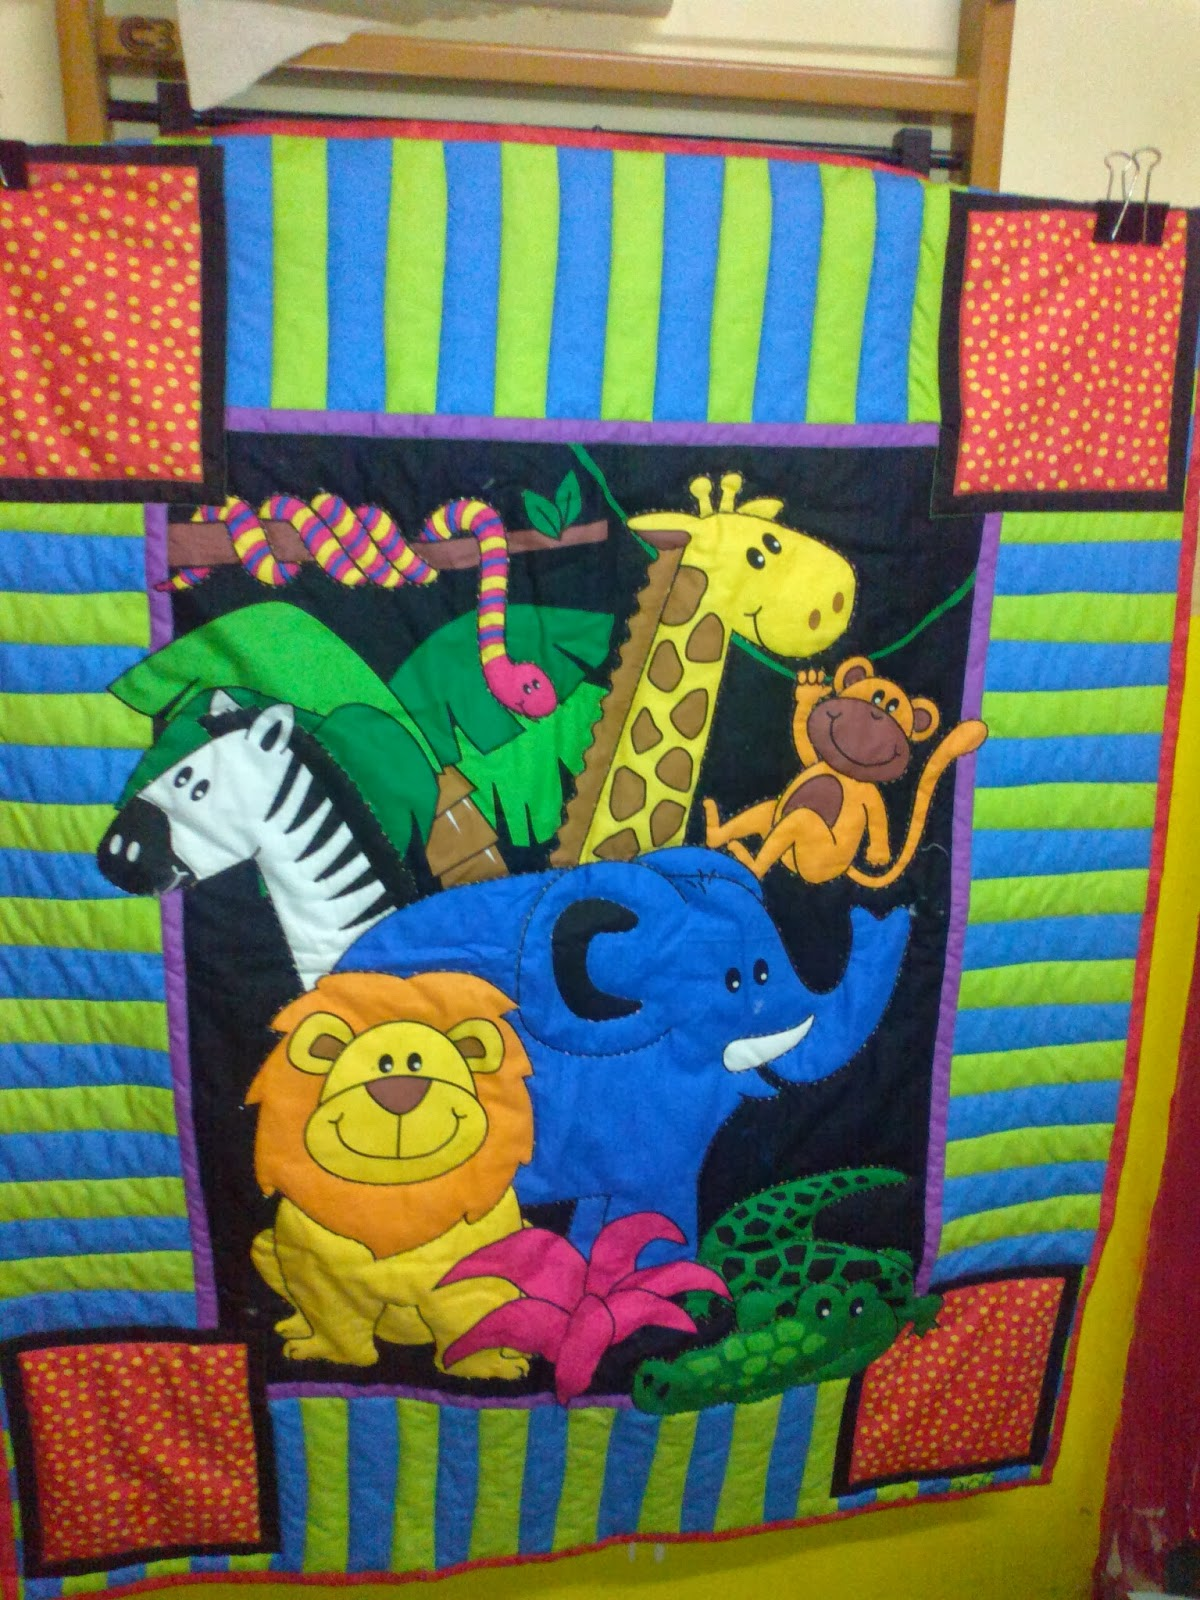 Colchas infantiles y de adultos colchas infantiles cuna - Colchas patchwork infantiles ...